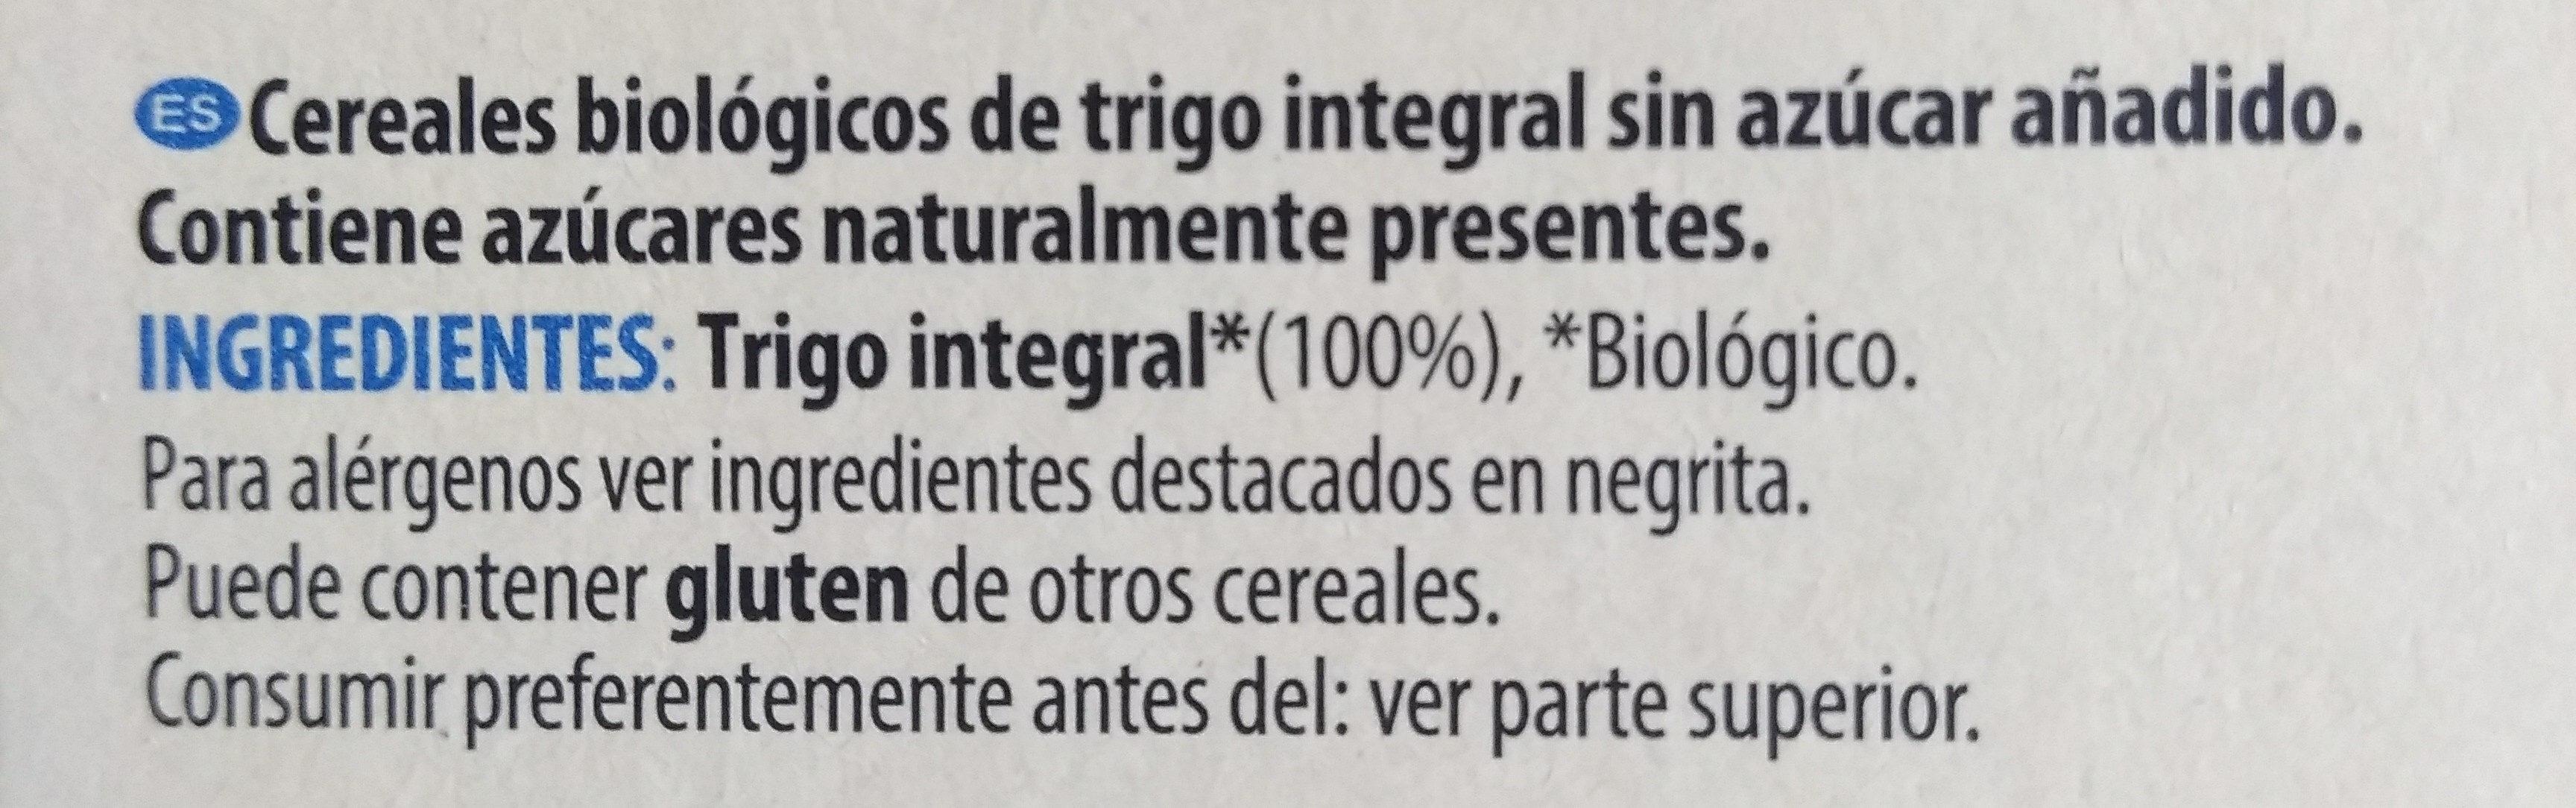 Cereali integrali original - Ingredientes - es